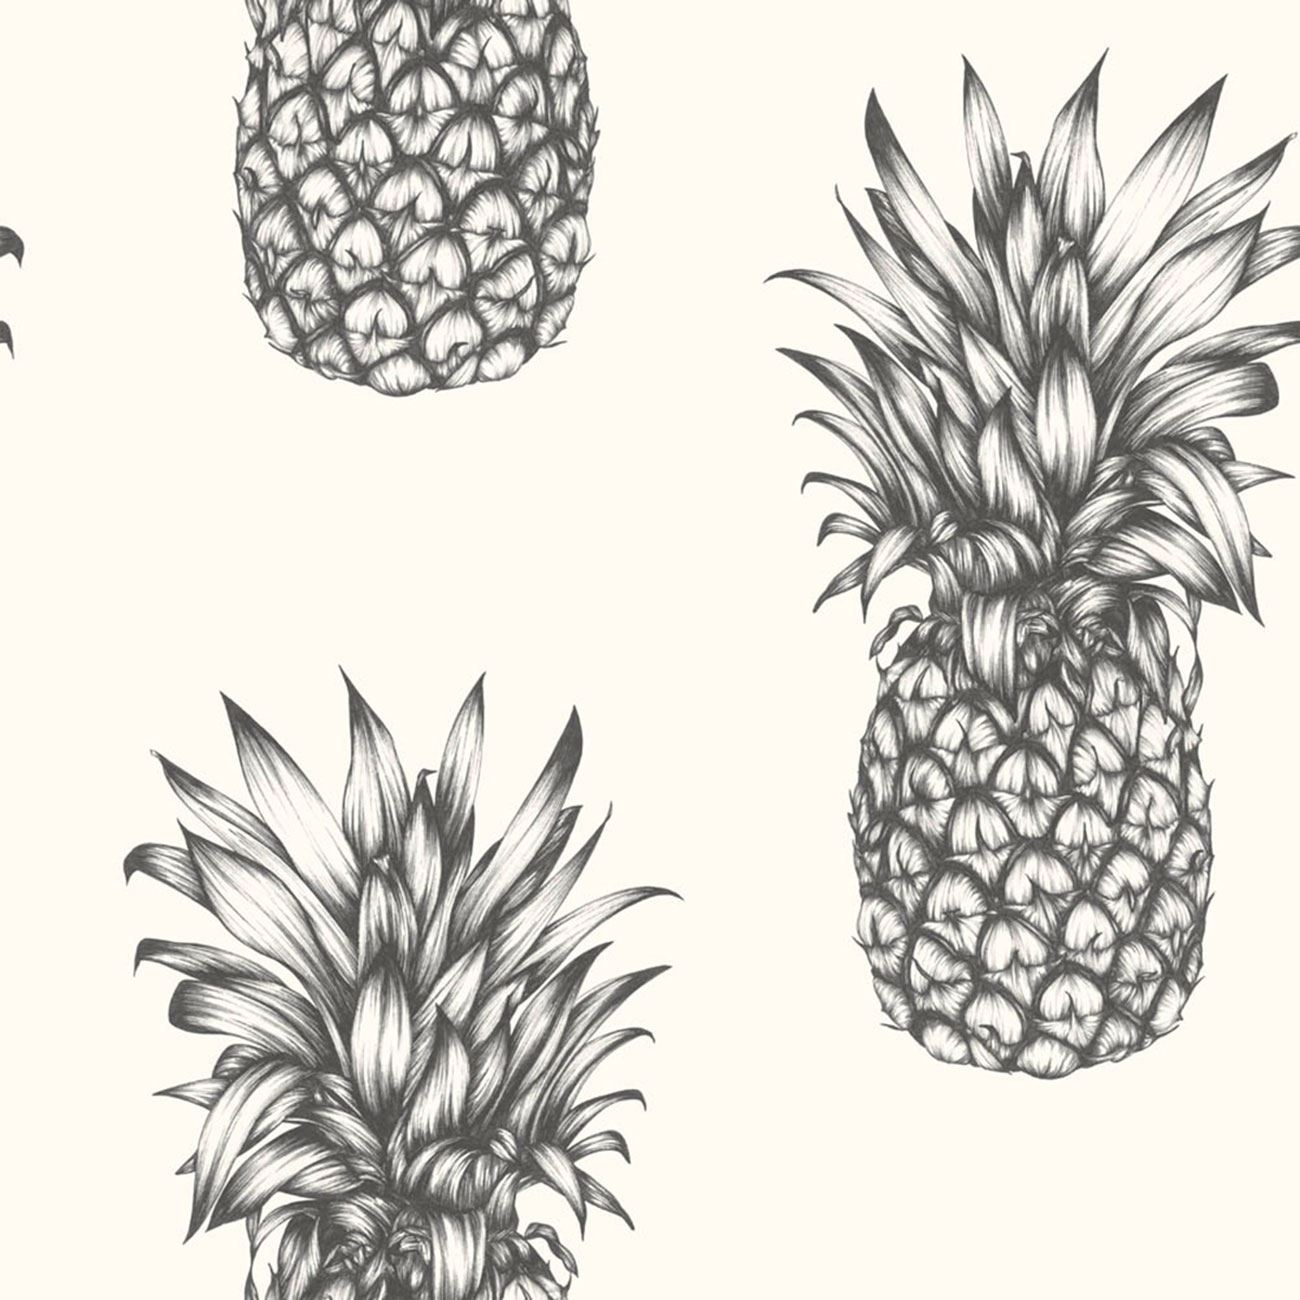 Tropics Copacabana Pineapple Wallpaper Rolls Black White